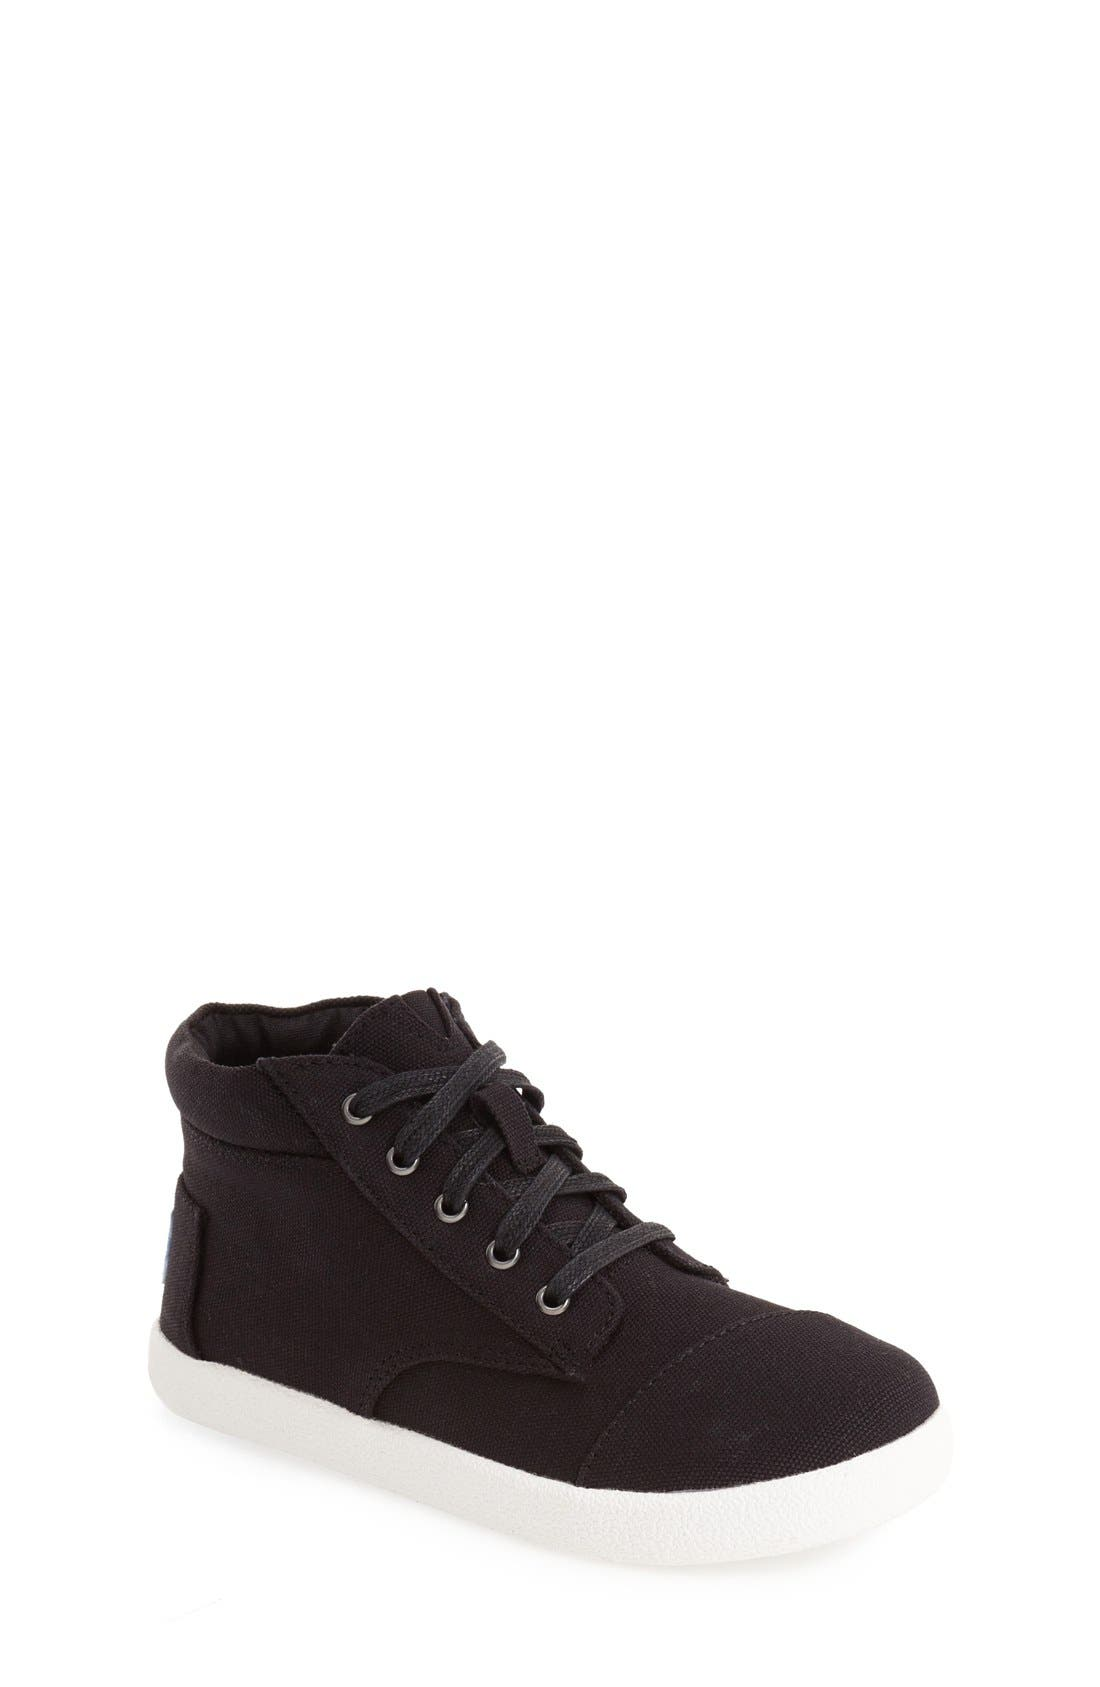 'Paseo' High Top Sneaker,                         Main,                         color, BLACK